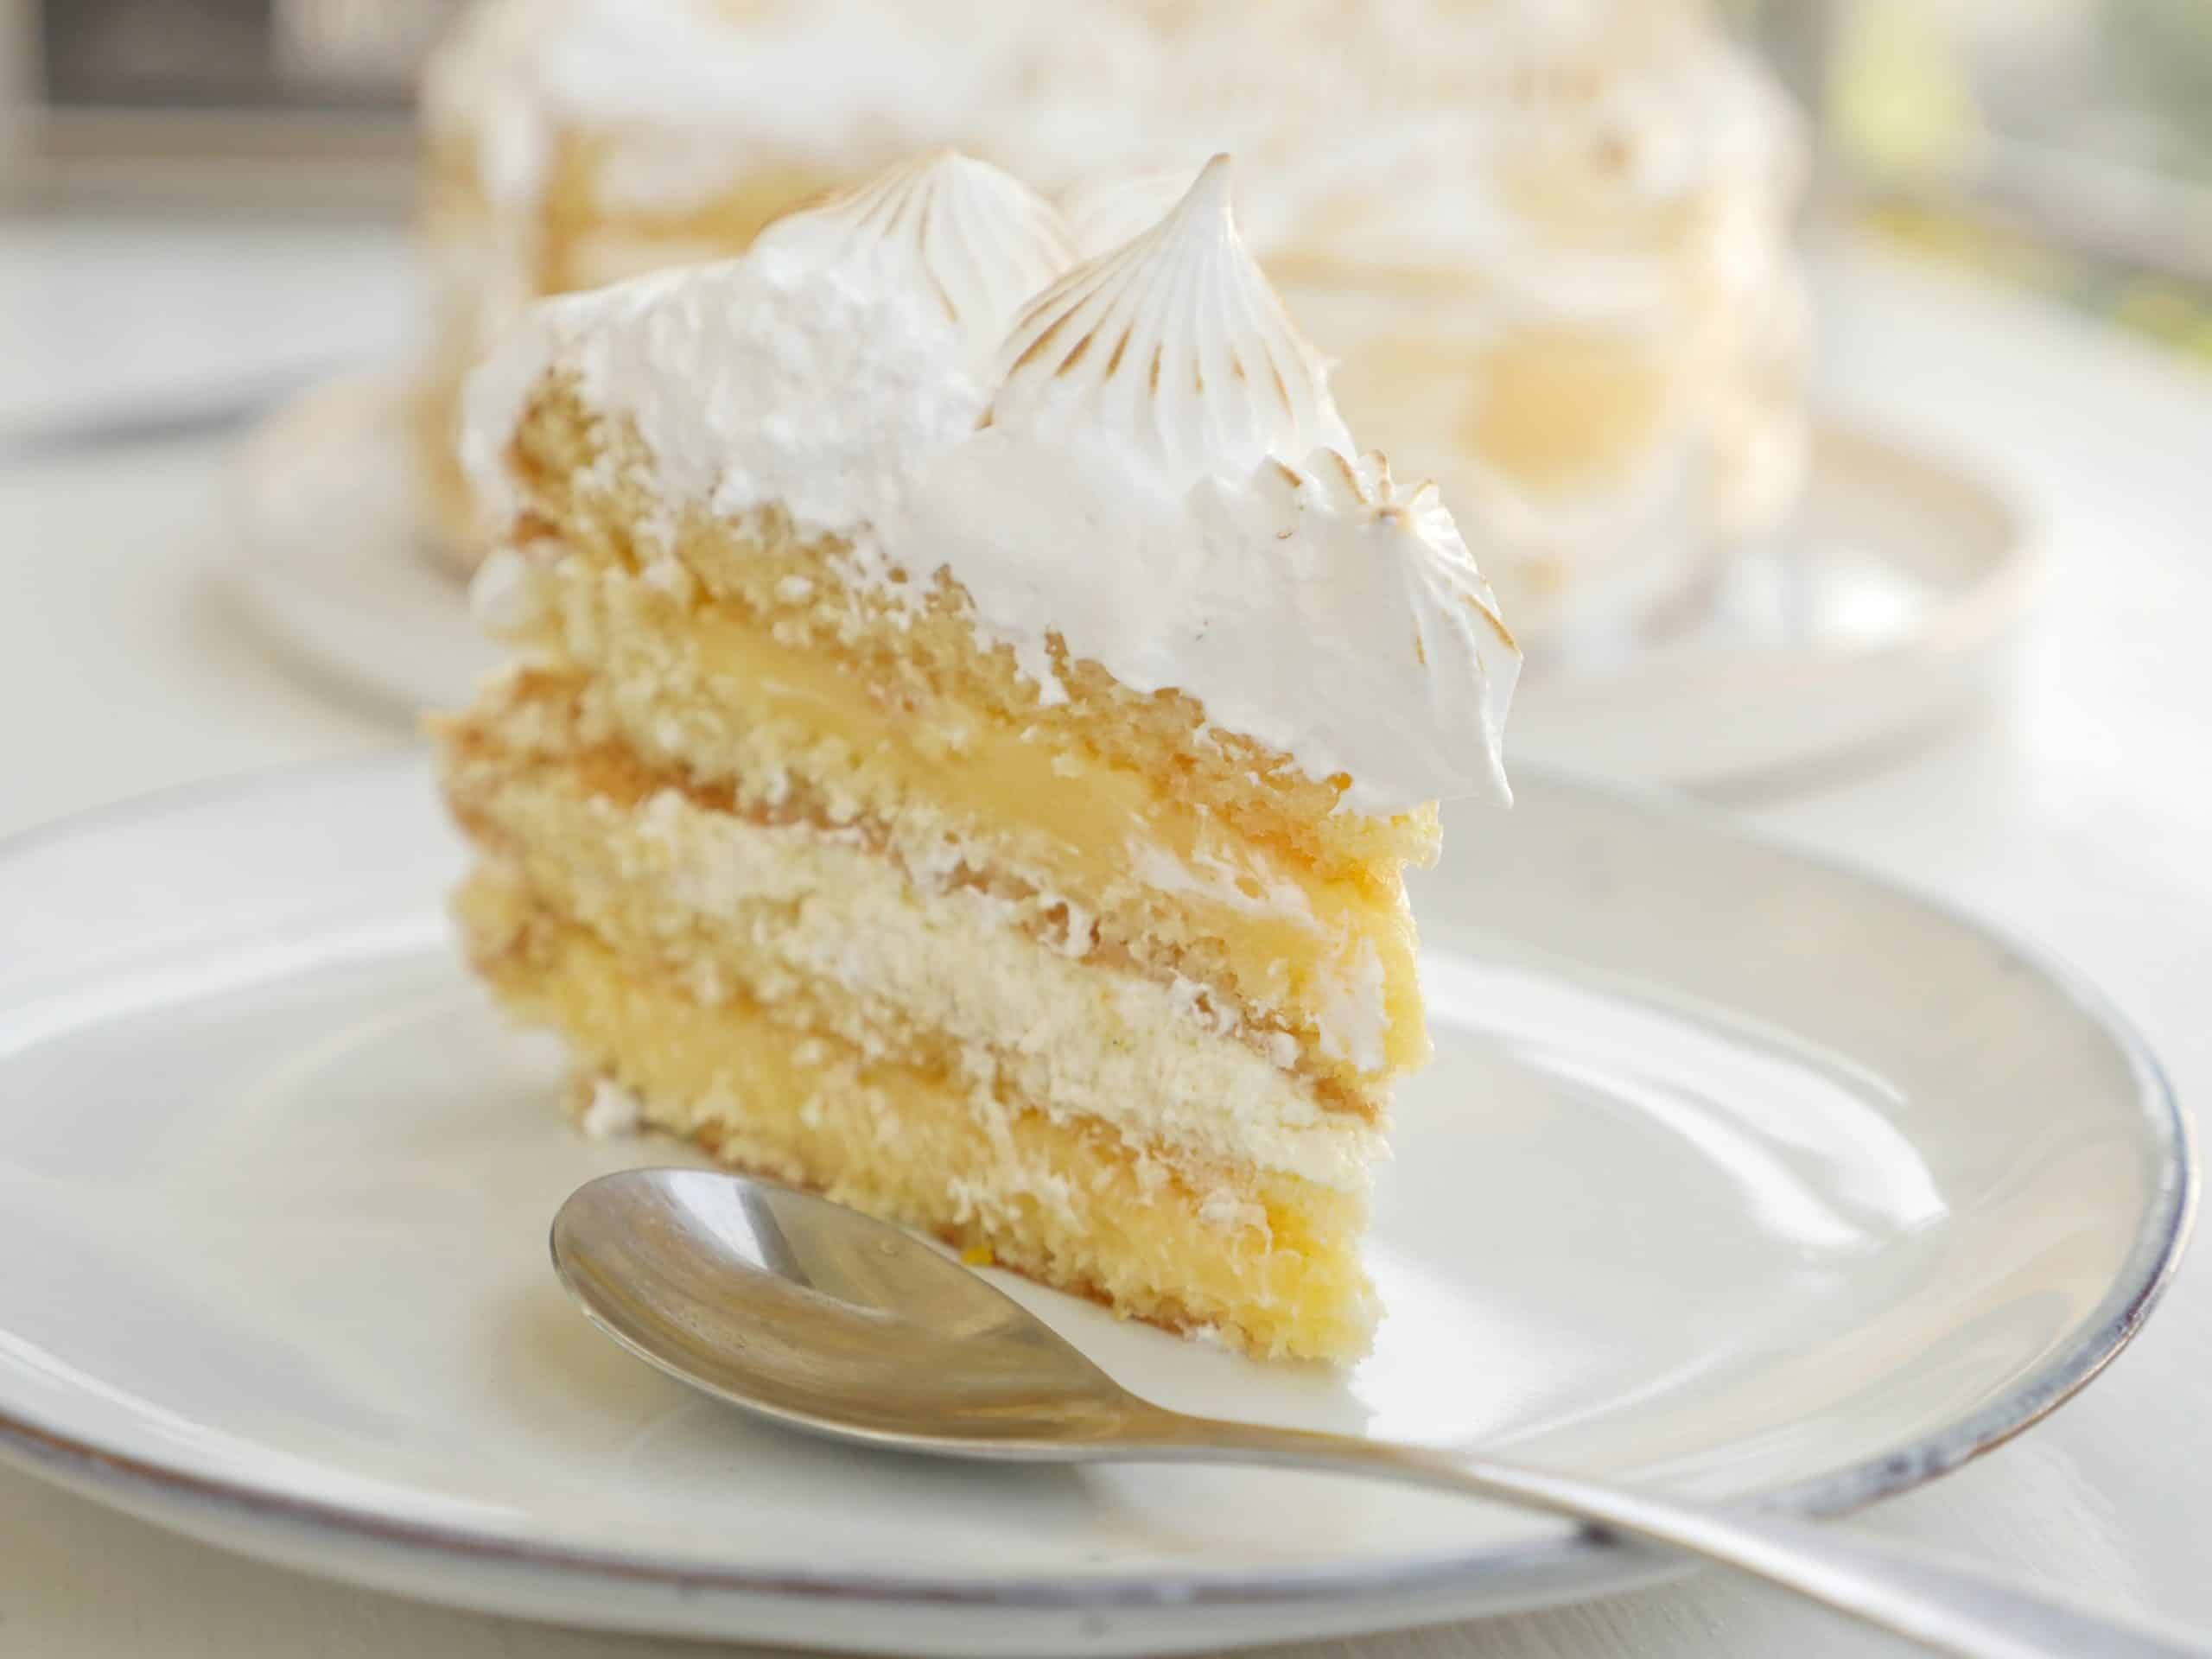 god citronmarängtårta